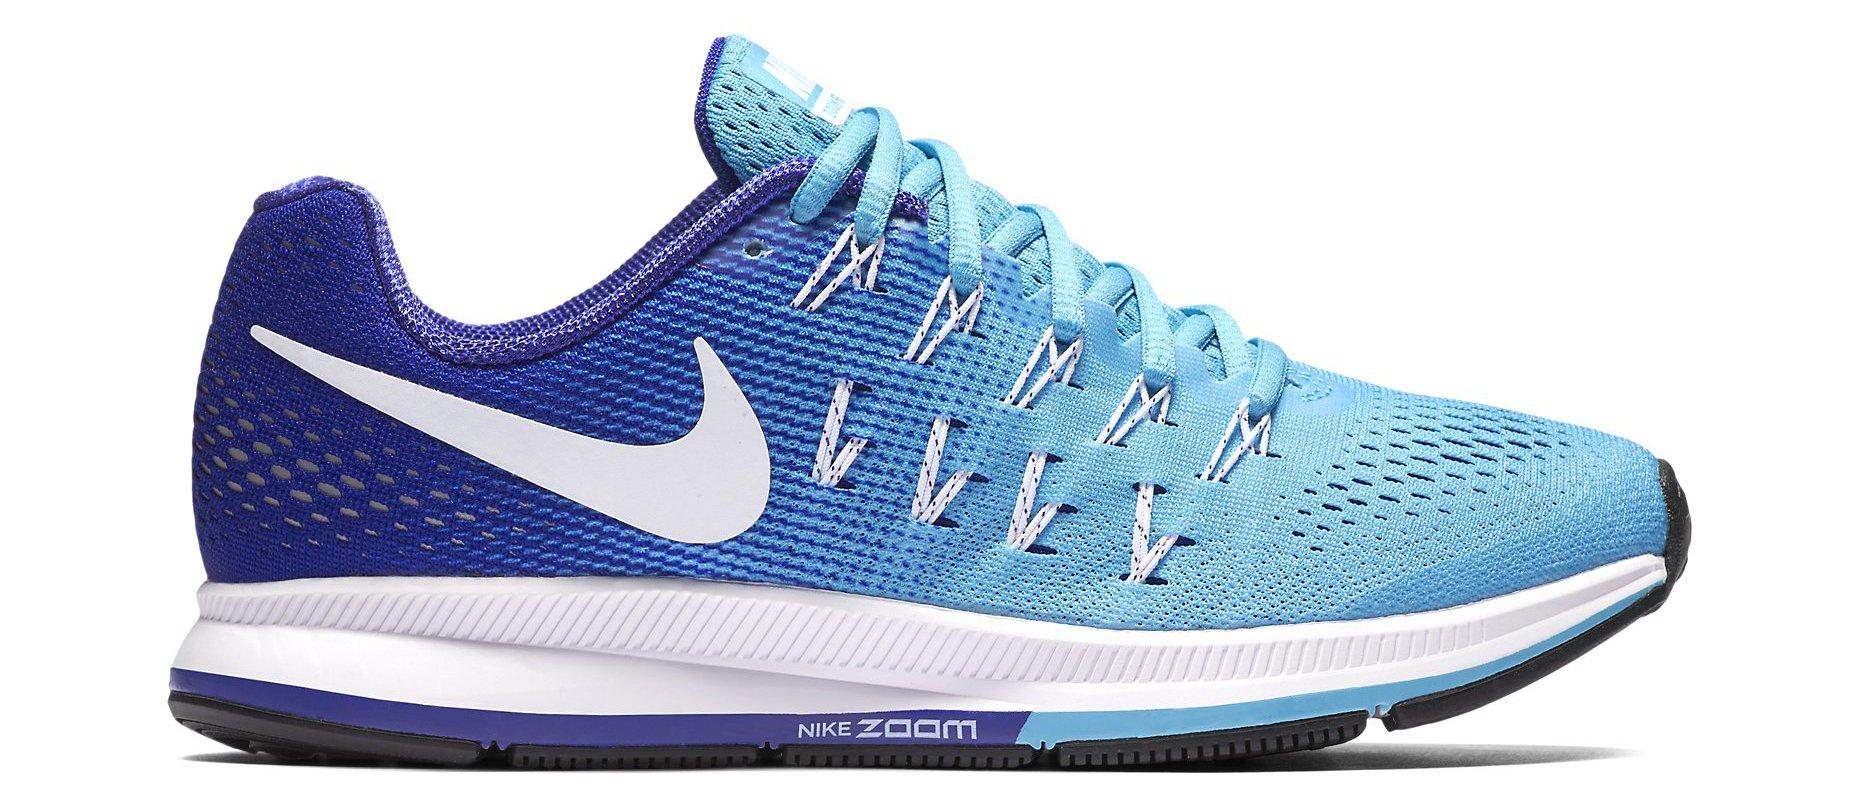 Dámské běžecké boty Nike Air Zoom Pegasus 33